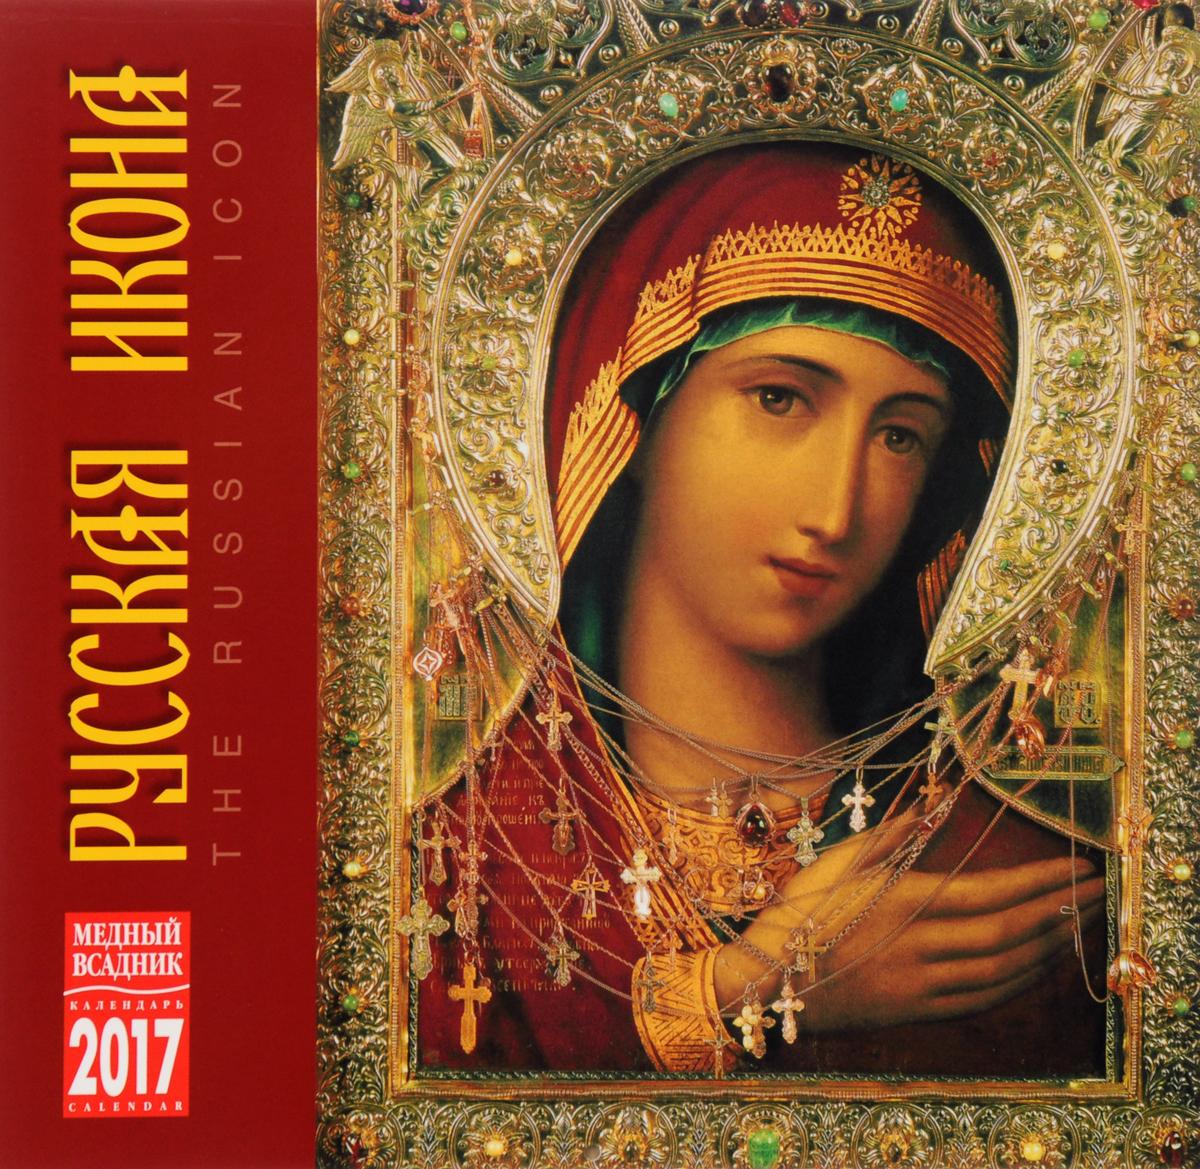 Календарь 2017 (на скрепке). Русская икона / The Russian Icon